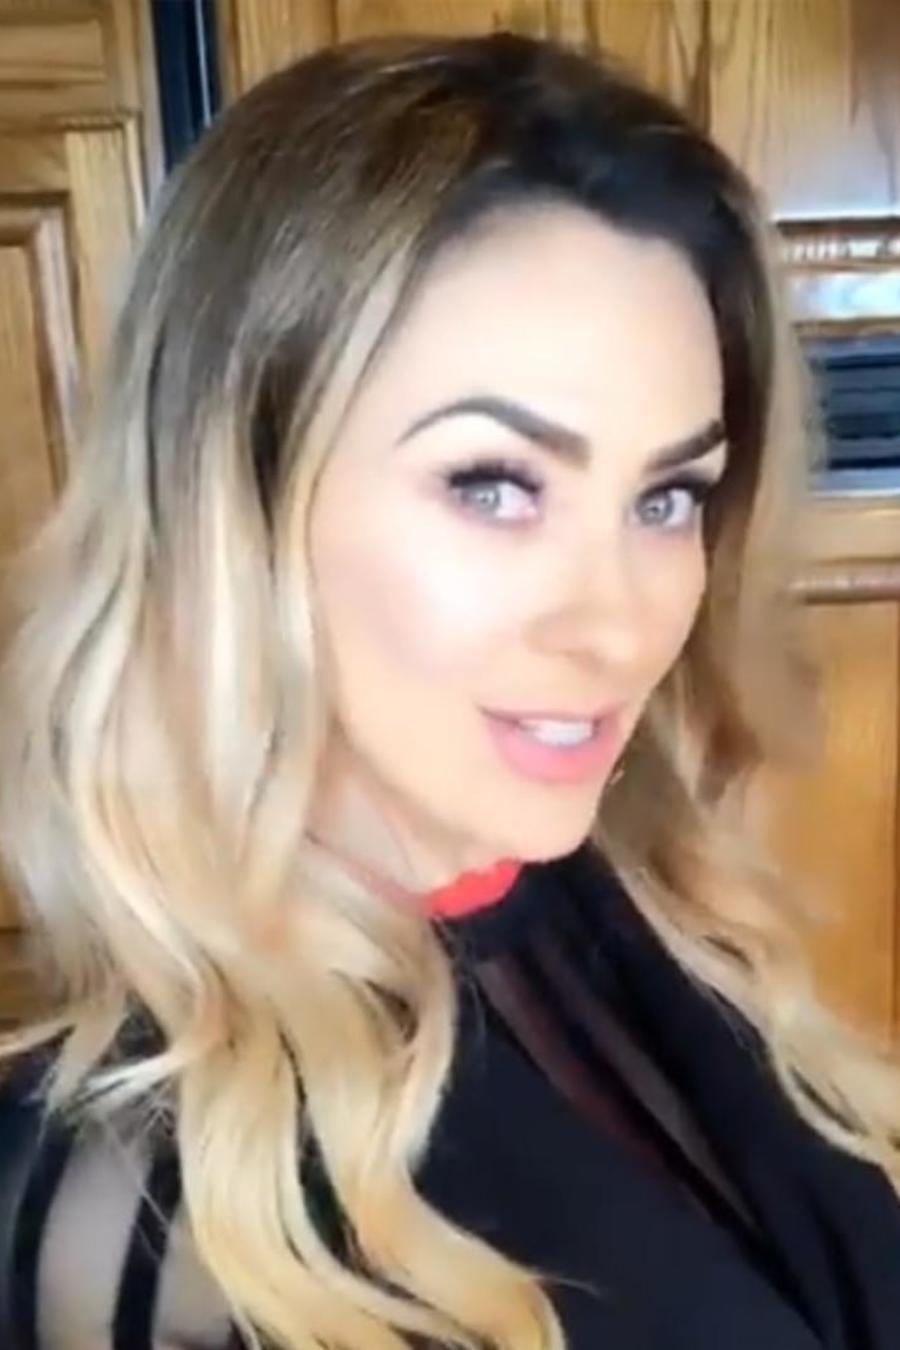 Aracely Arambula vistiendo una blusa negra